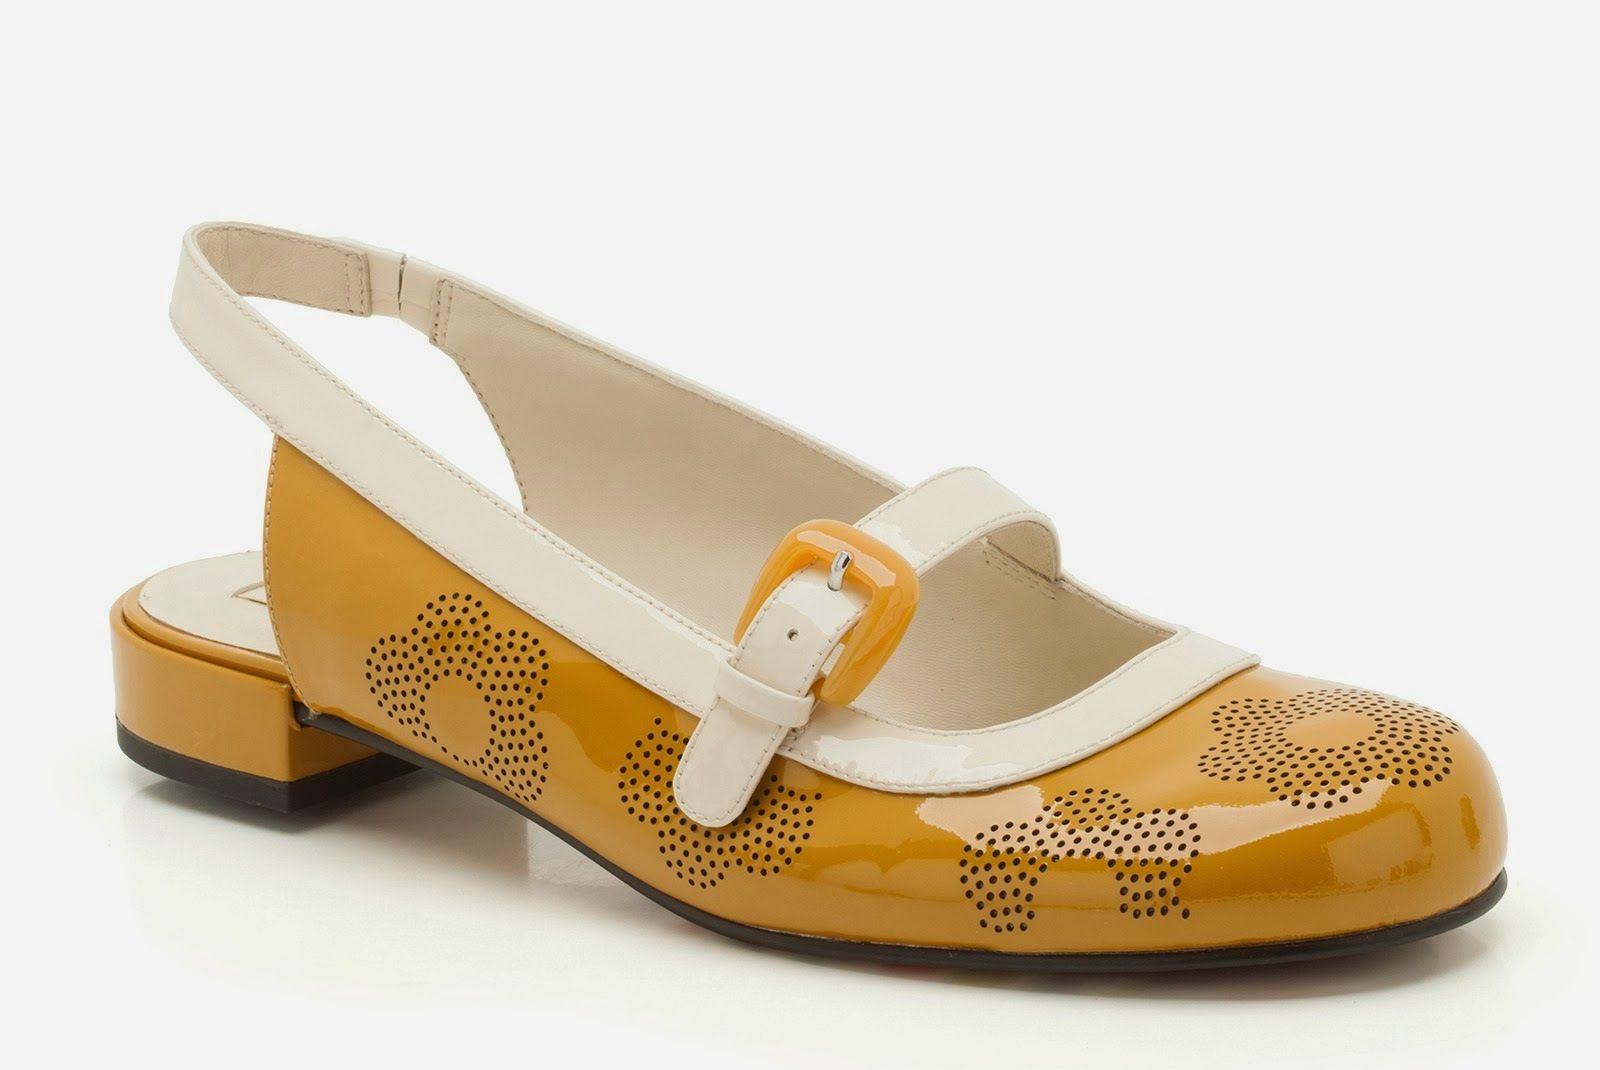 Orla Kiely x Clarks - Mustard Milly Shoes